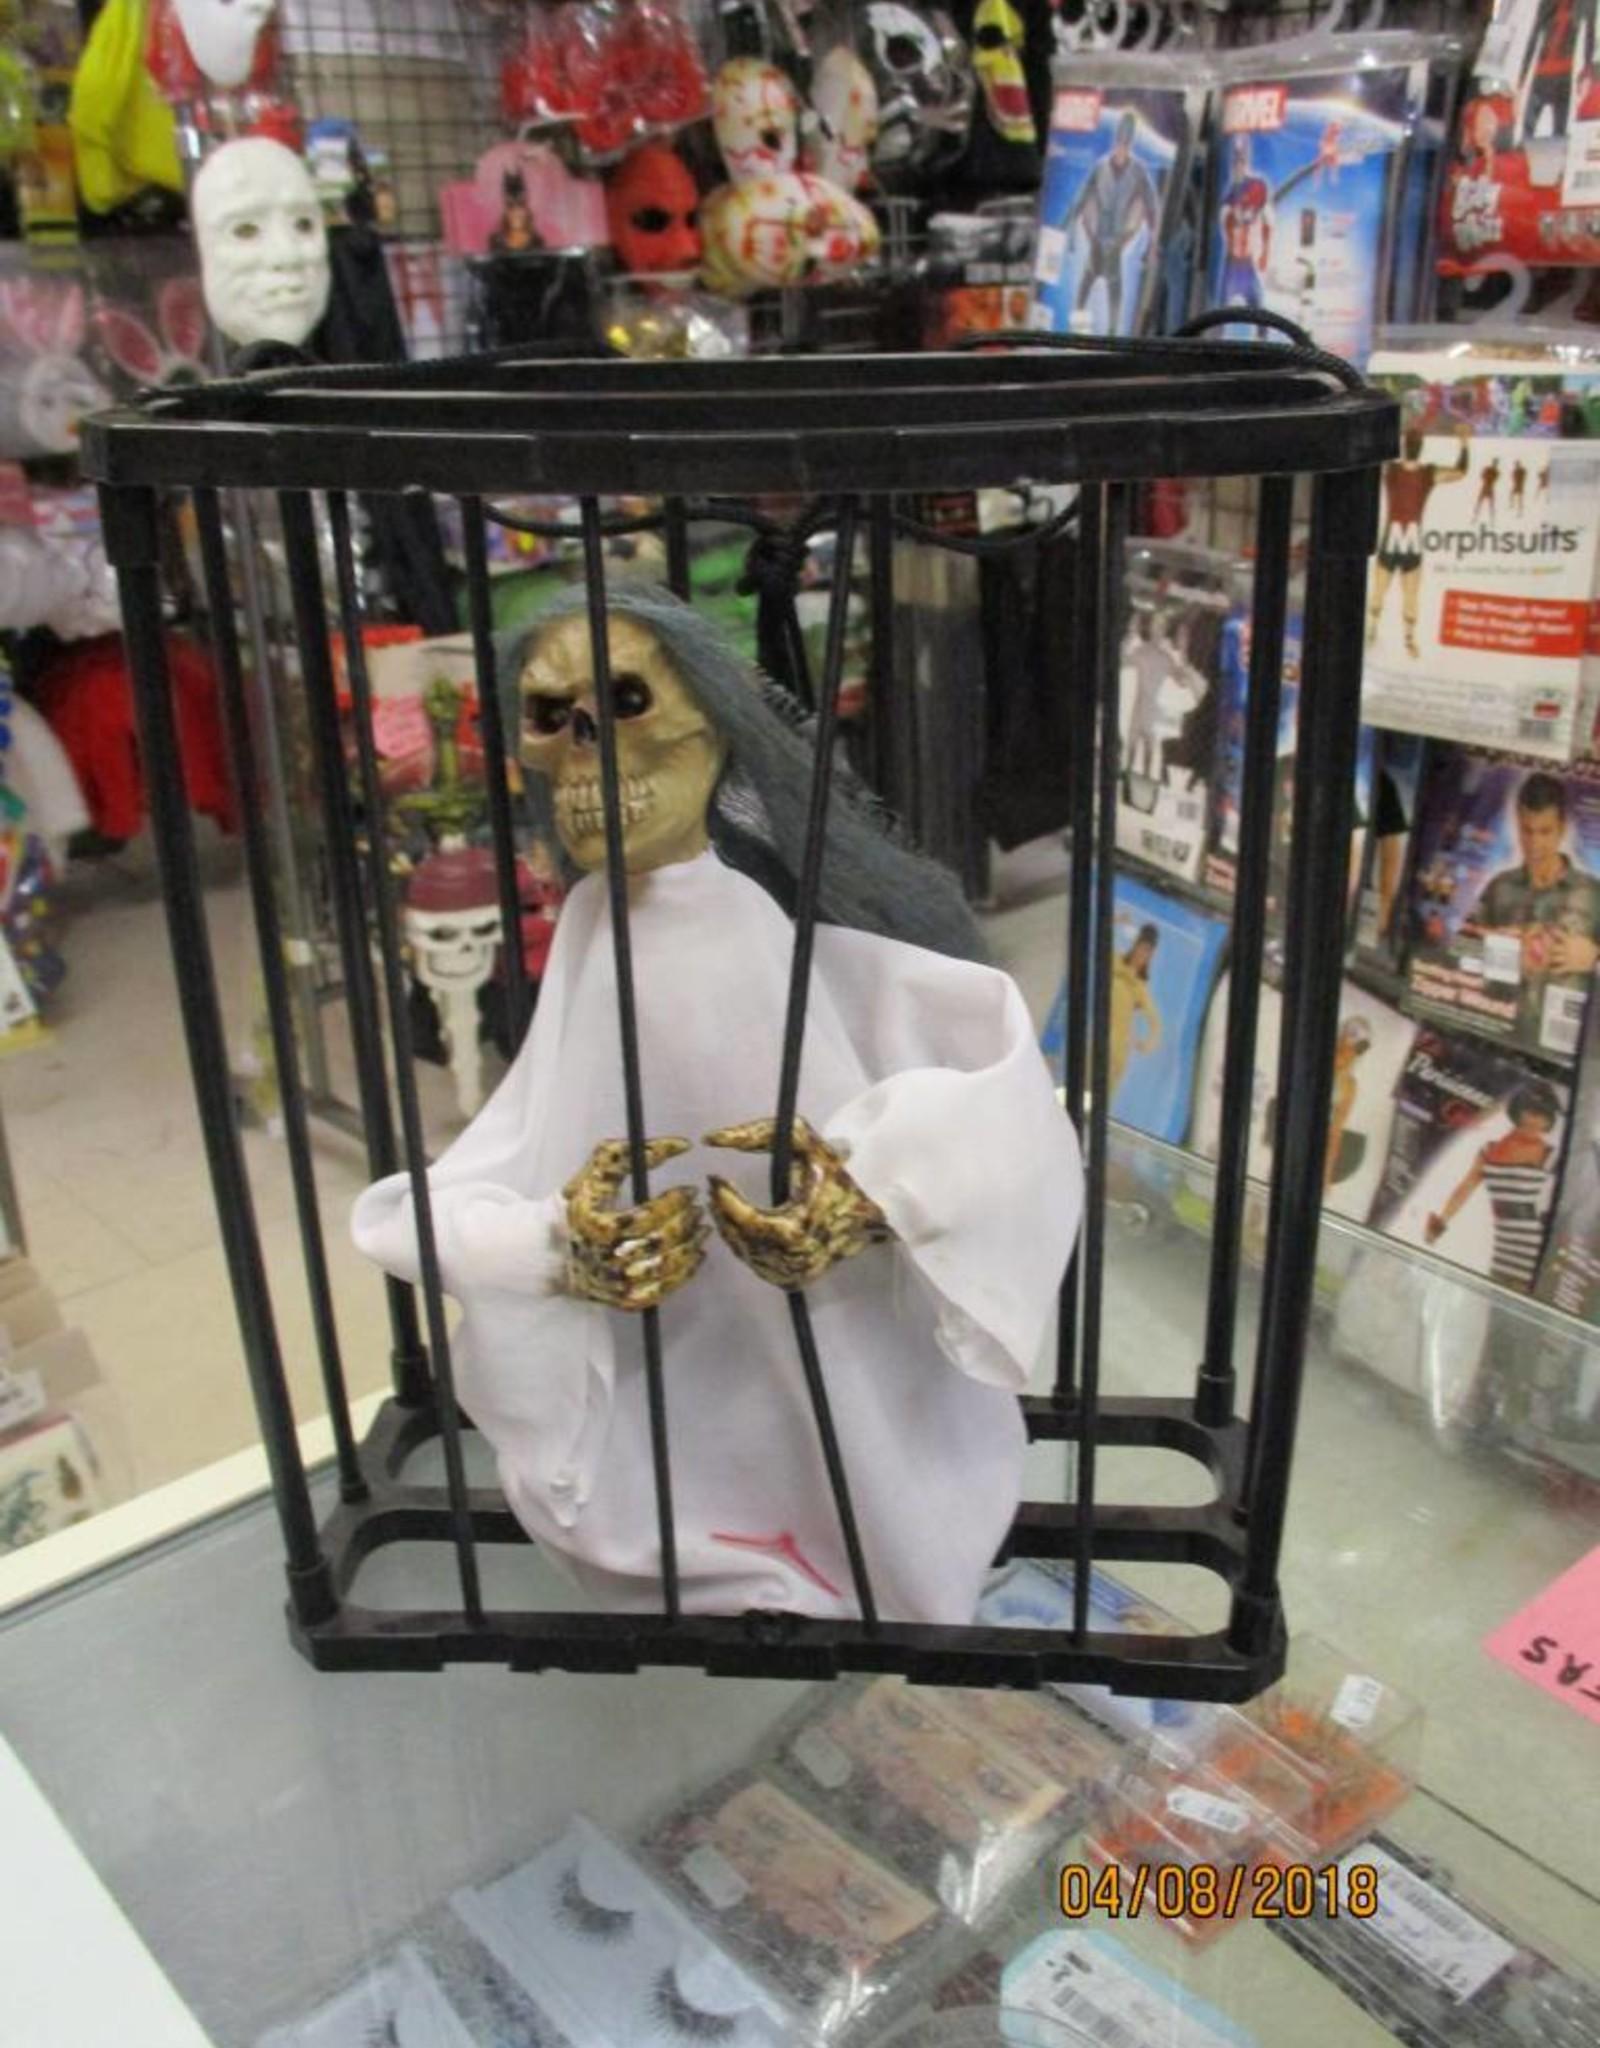 ESPA spook in kooi help me